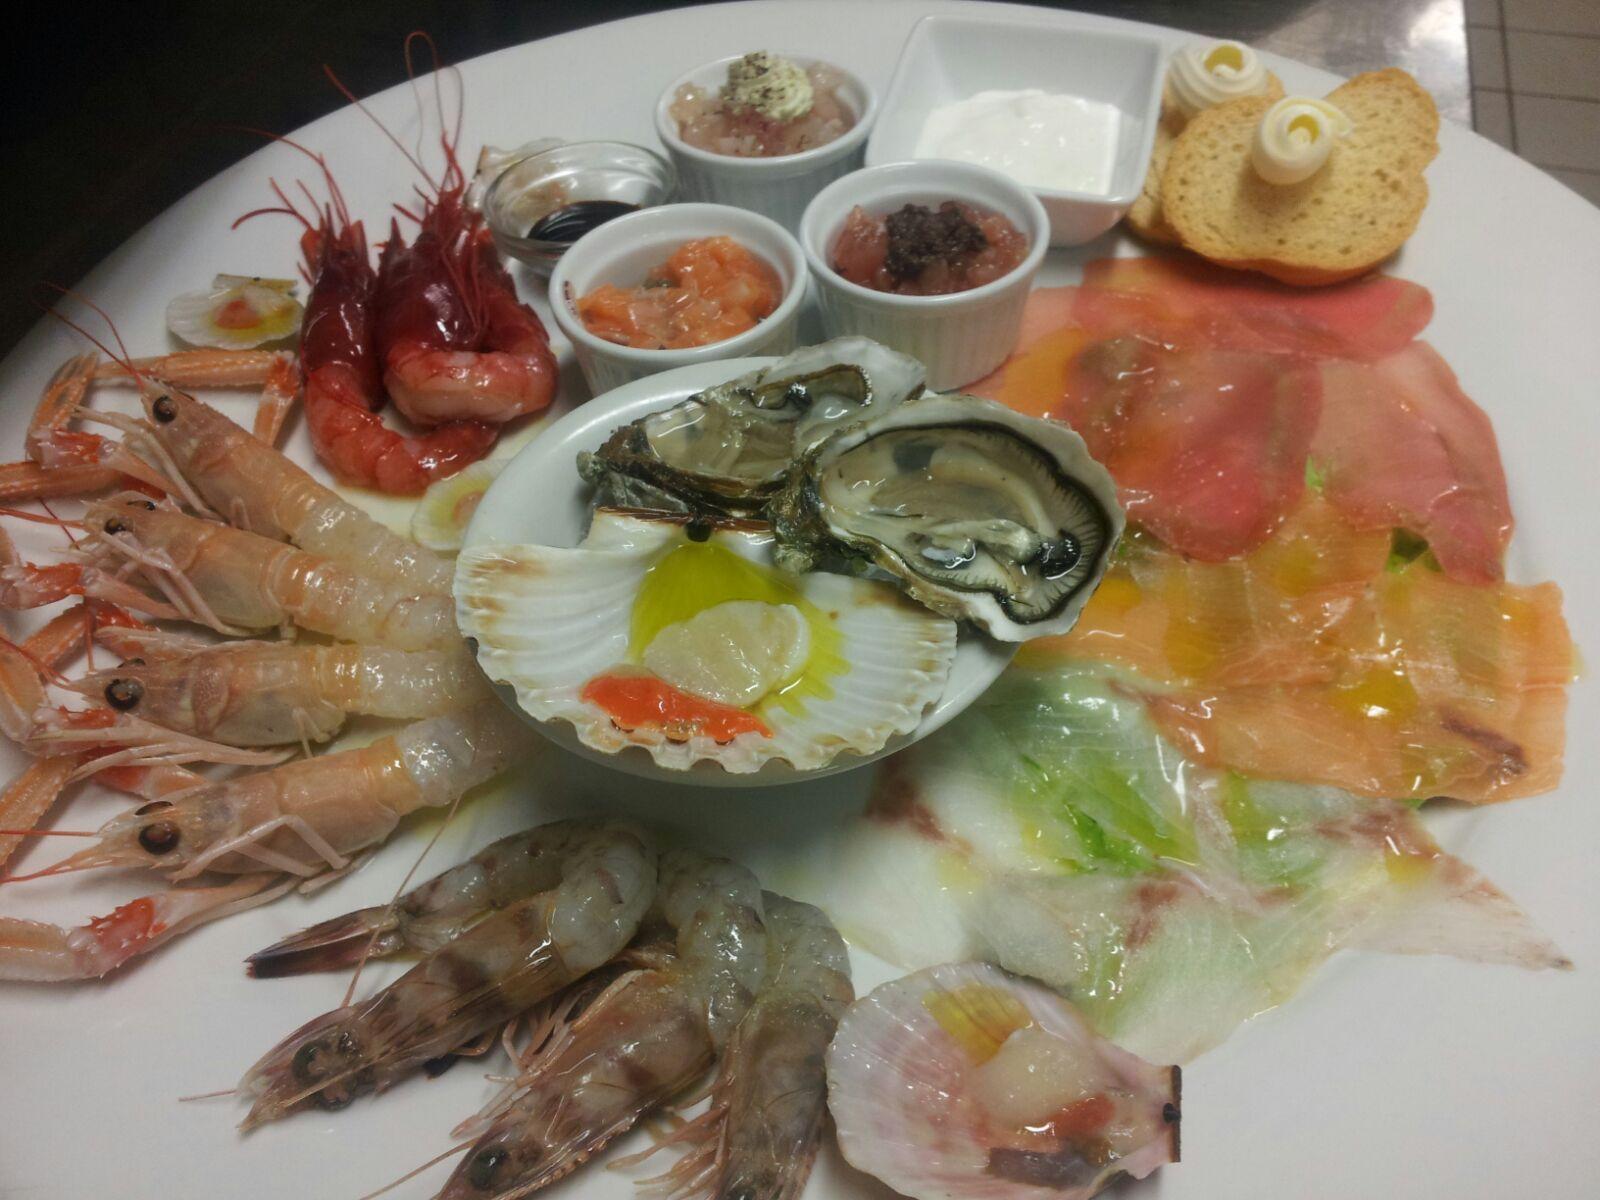 Cruditè di pesce. Scampi, Gamberi rossi e grigi, ostriche, capasanta nostrana, carpaccio di tonno e di salmone, t… | Ricette, Ricette antipasti pesce, Ricette crude